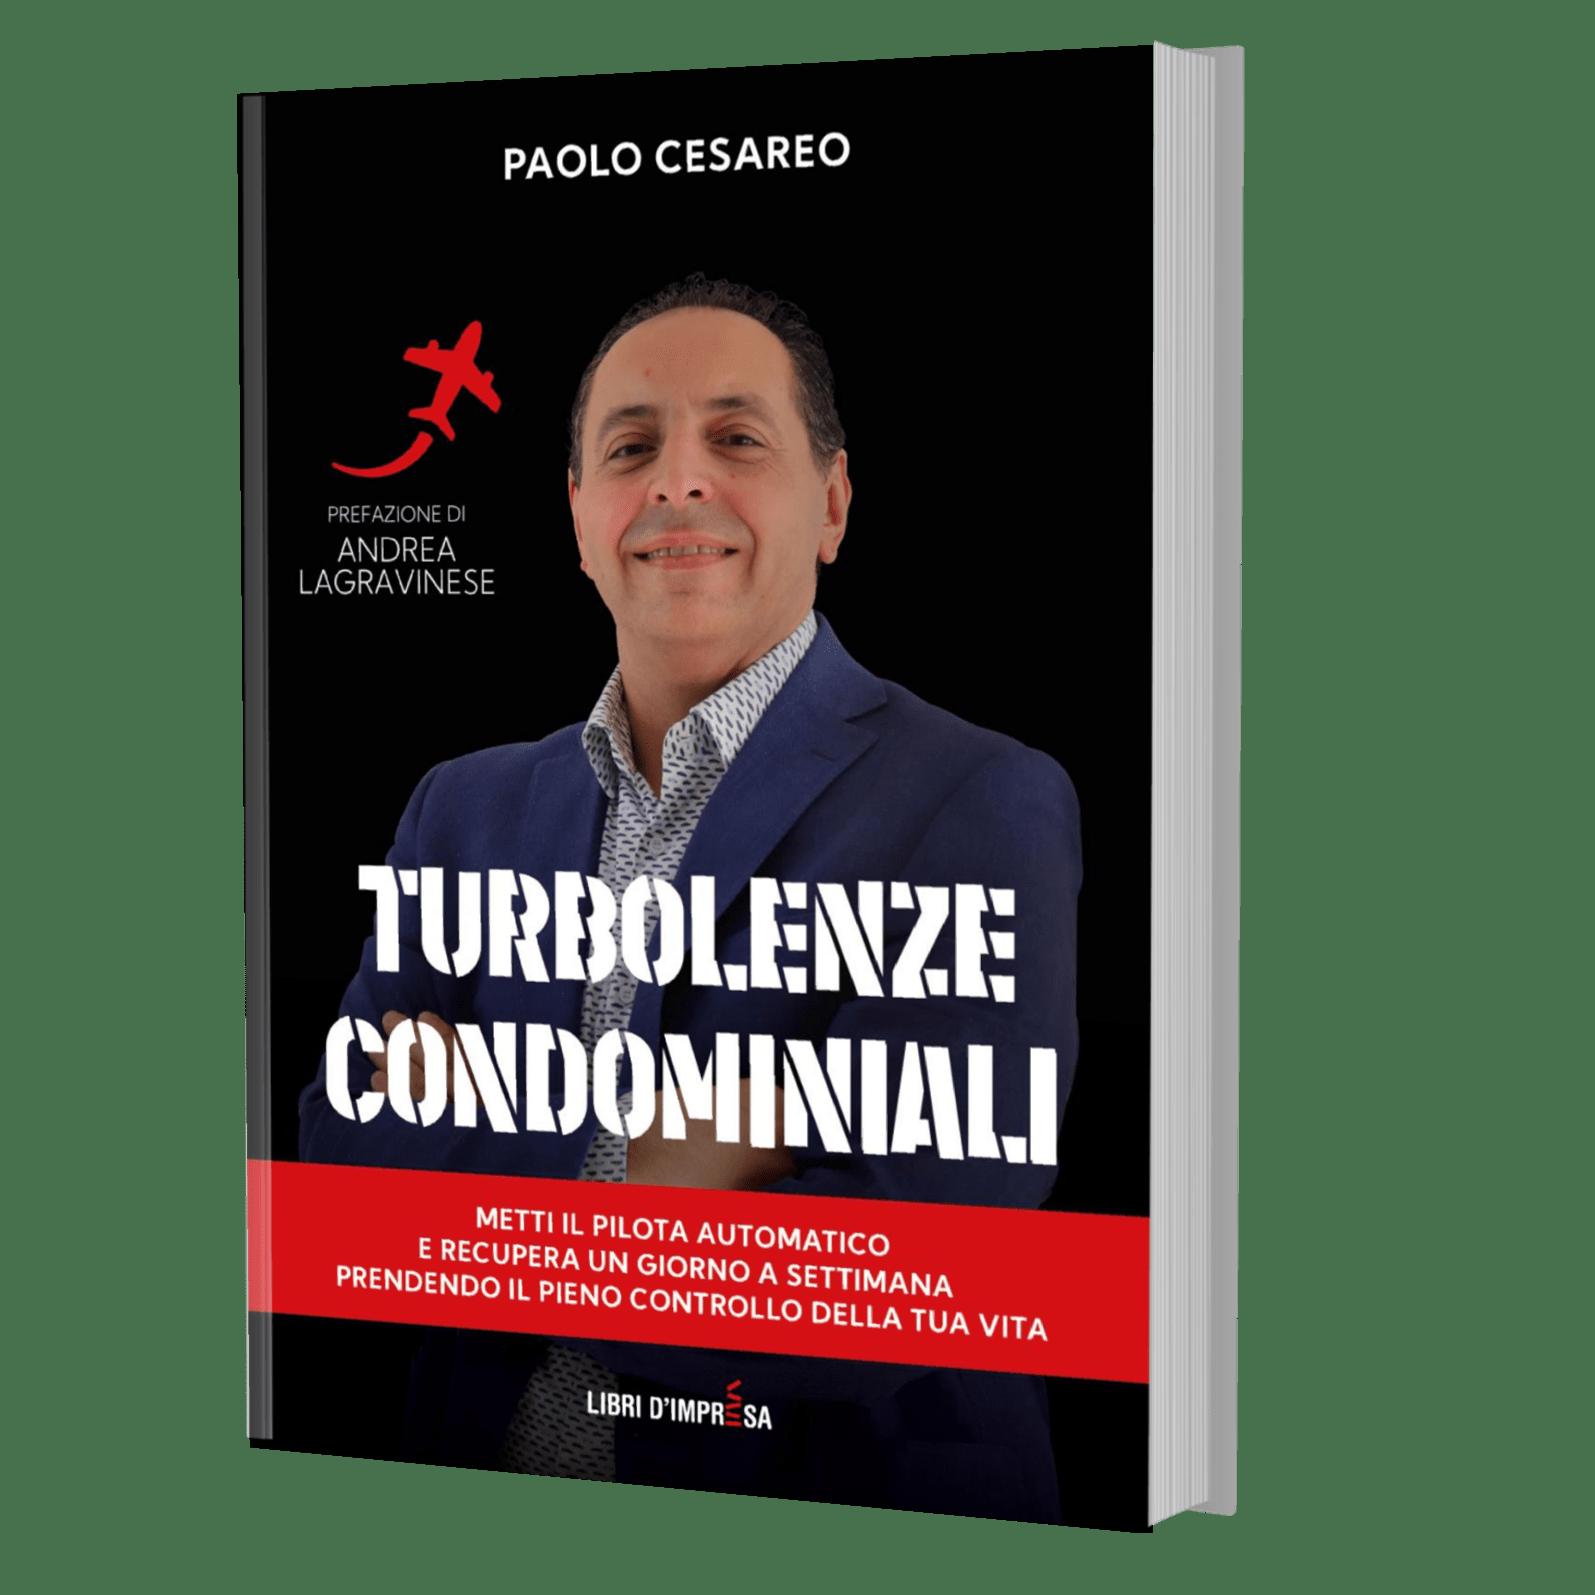 Turbolenze Condominiali - libro di Paolo Cesareo - Libro d'Impresa